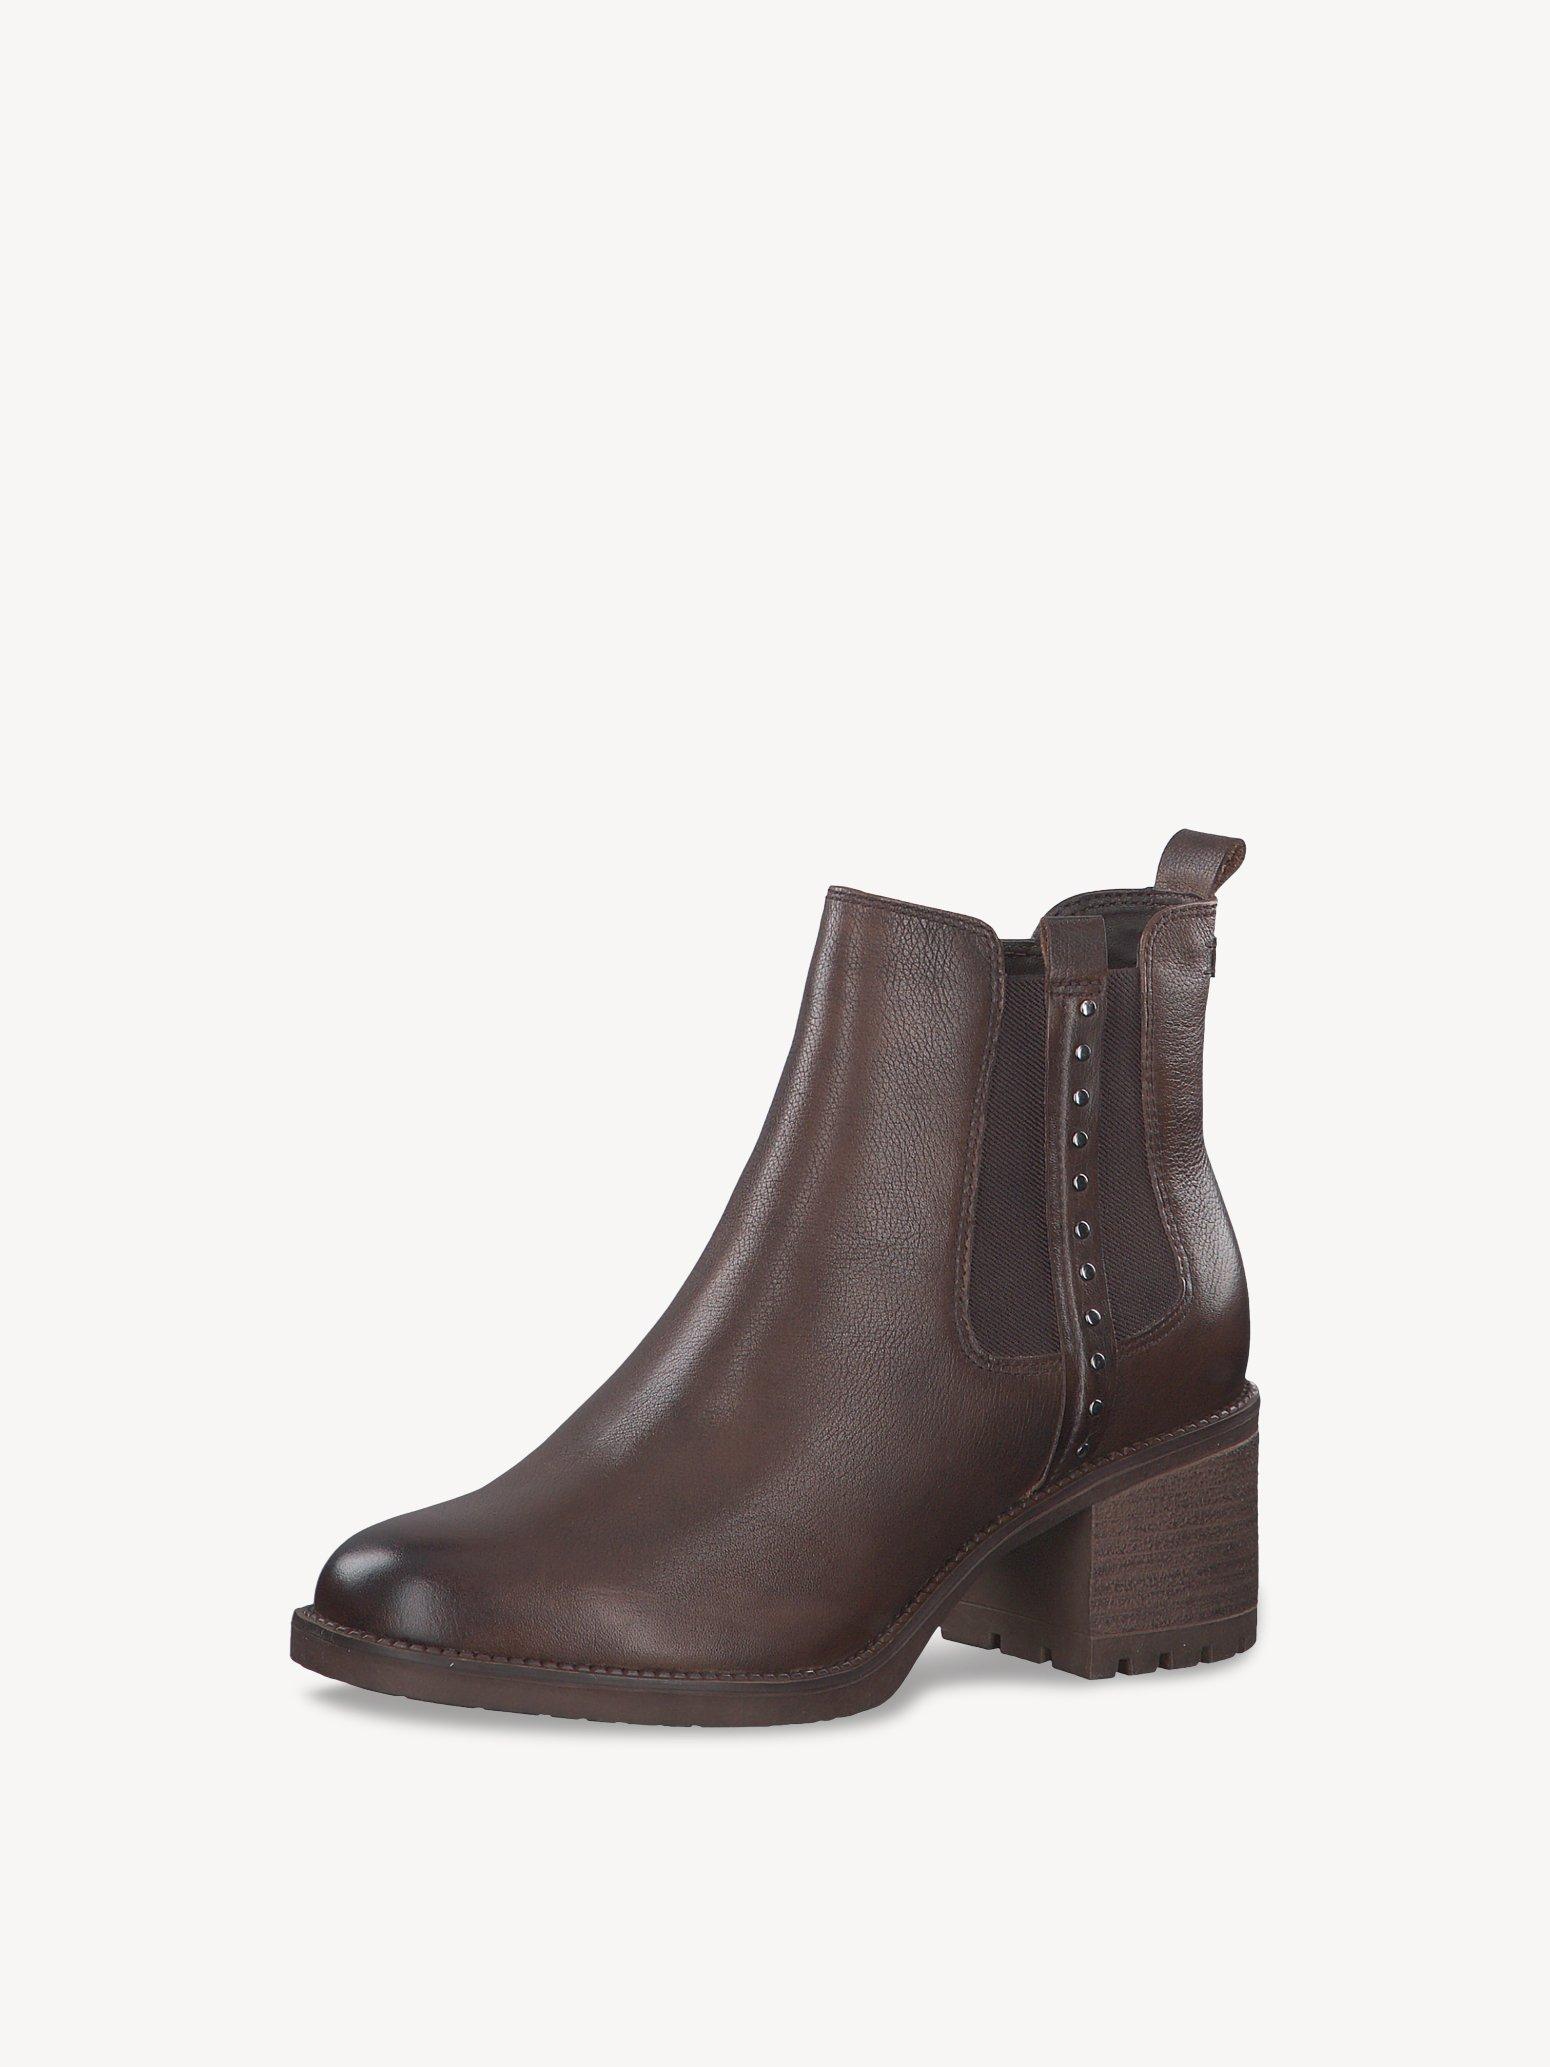 Ботинки челси Tamaris 1-1-25406-25-361